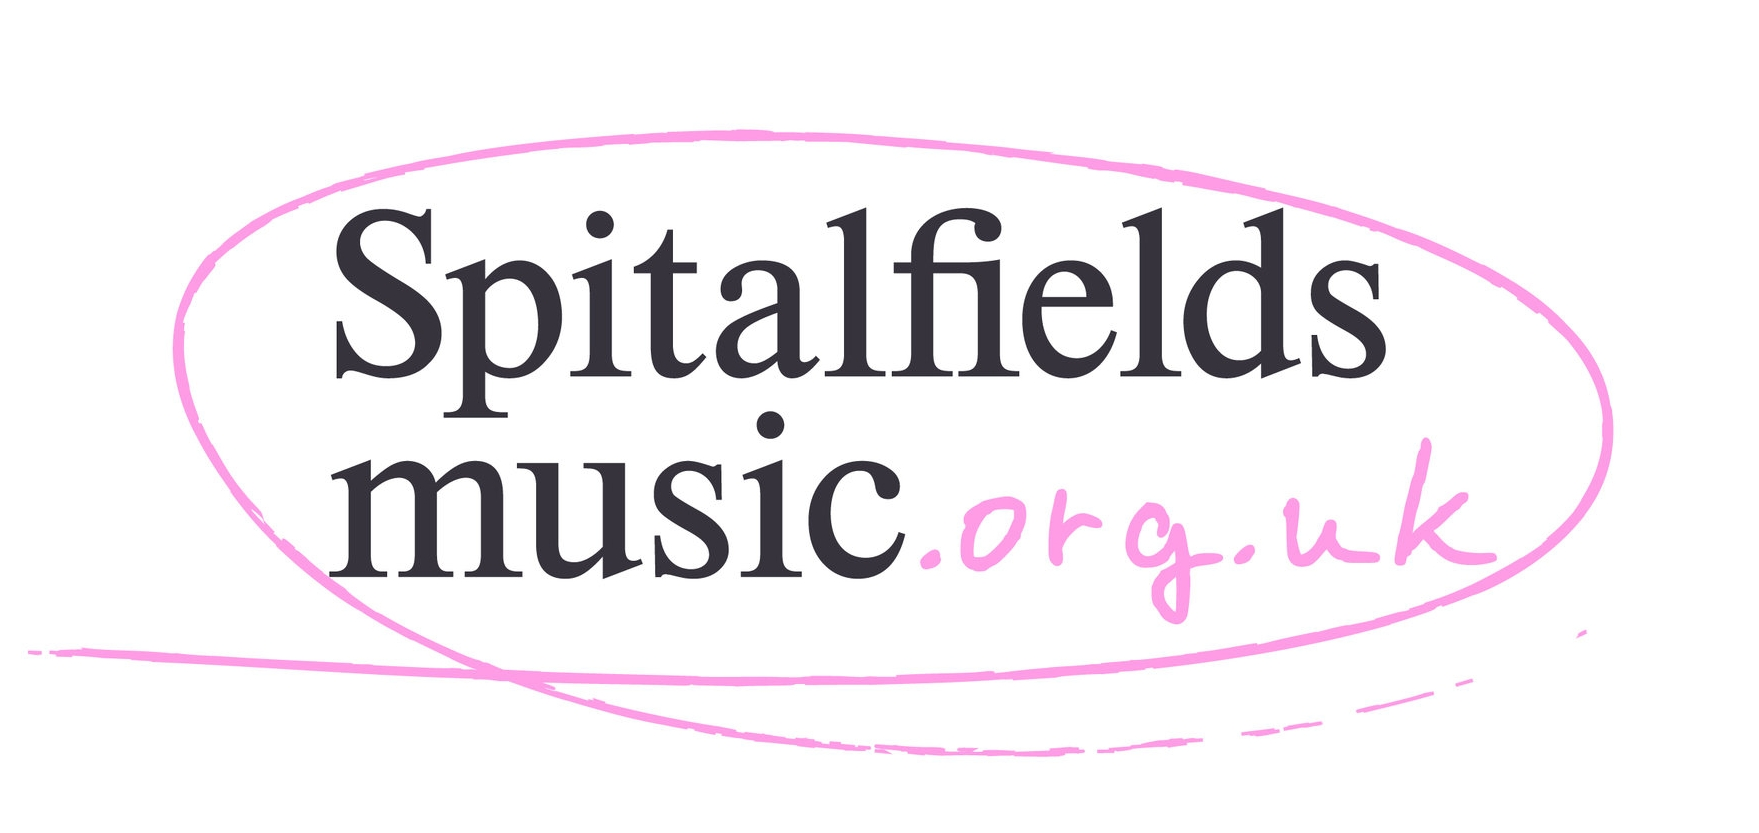 Big Sing workshops pianist:  https://www.spitalfieldsmusic.org.uk/events/the-big-sing/